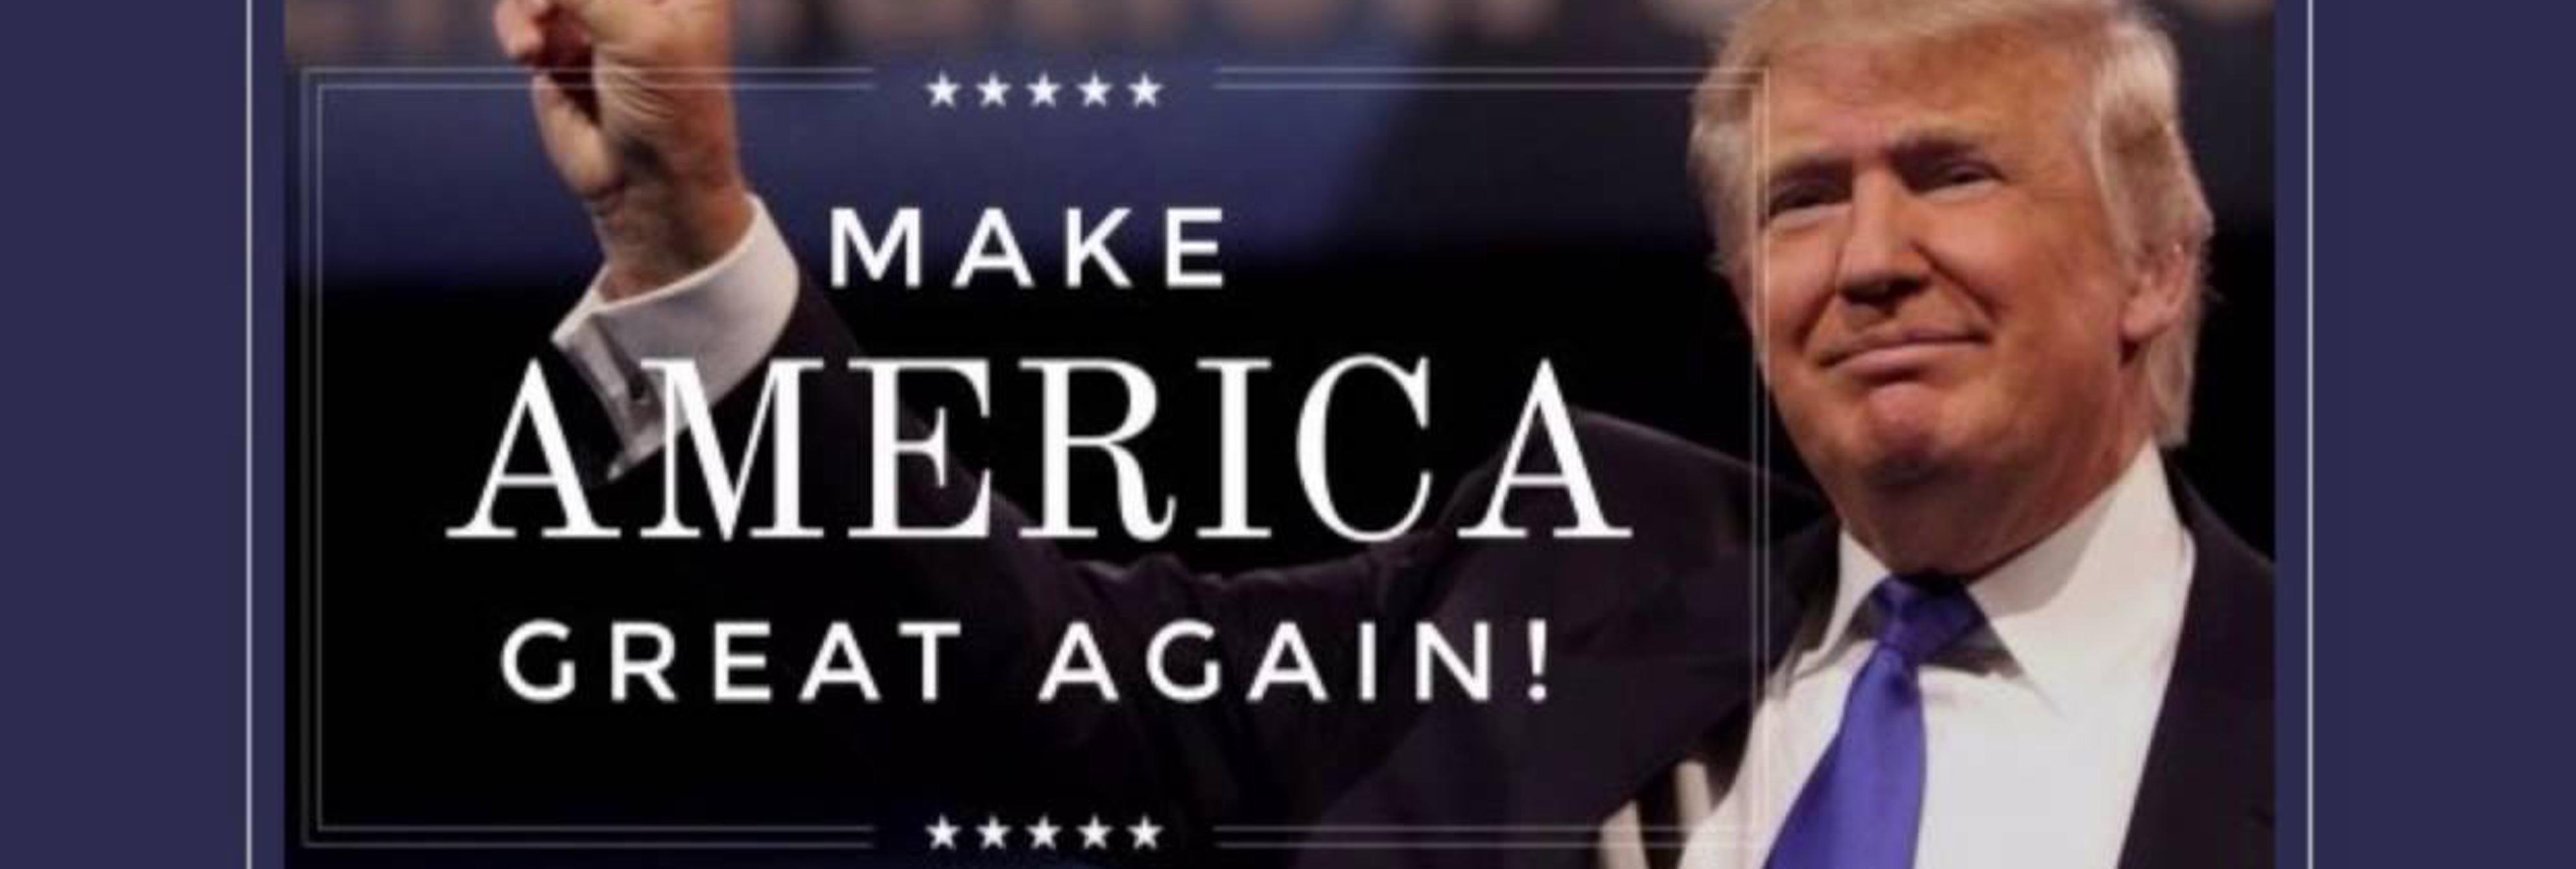 Adolf Hitler prometió lo mismo que Donald Trump: 'Make Germany Great Again'